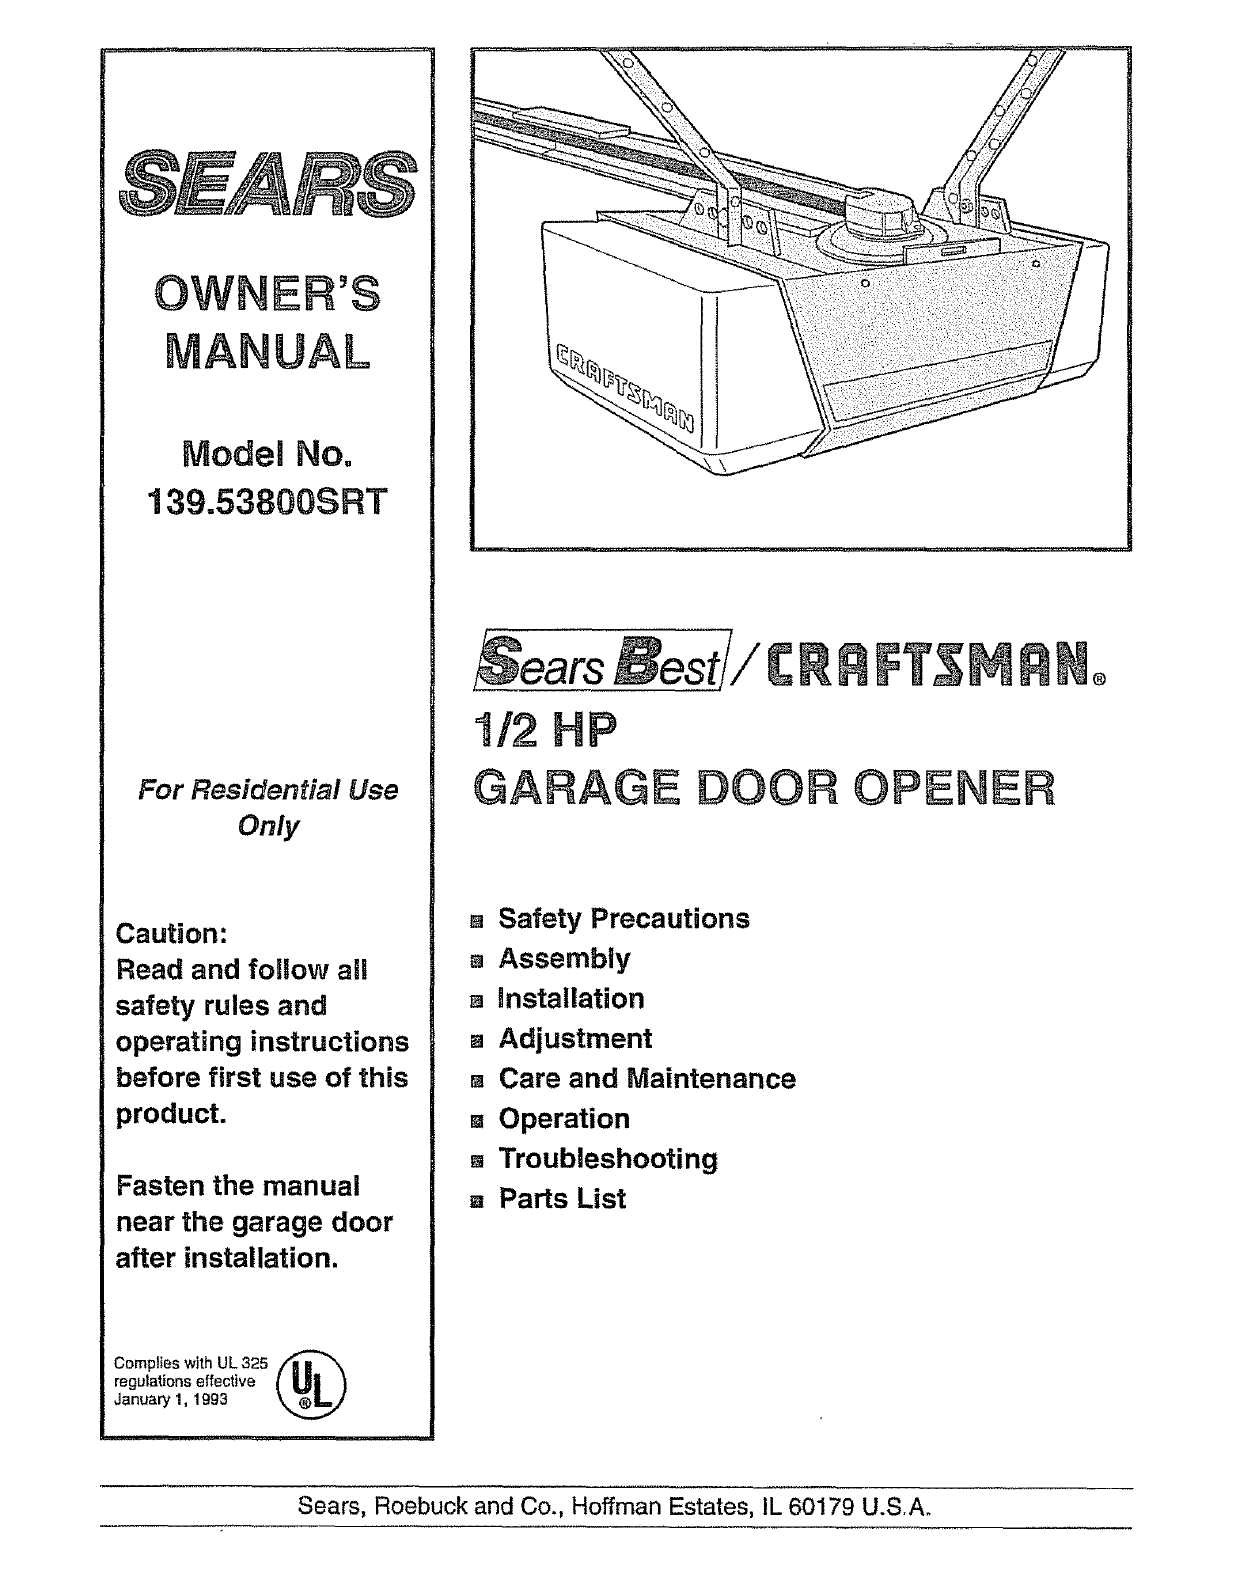 hight resolution of craftsman 13953800srt user manual 1 2 hp garage door opener manuals installation diagram and parts list for craftsman garagedooropener